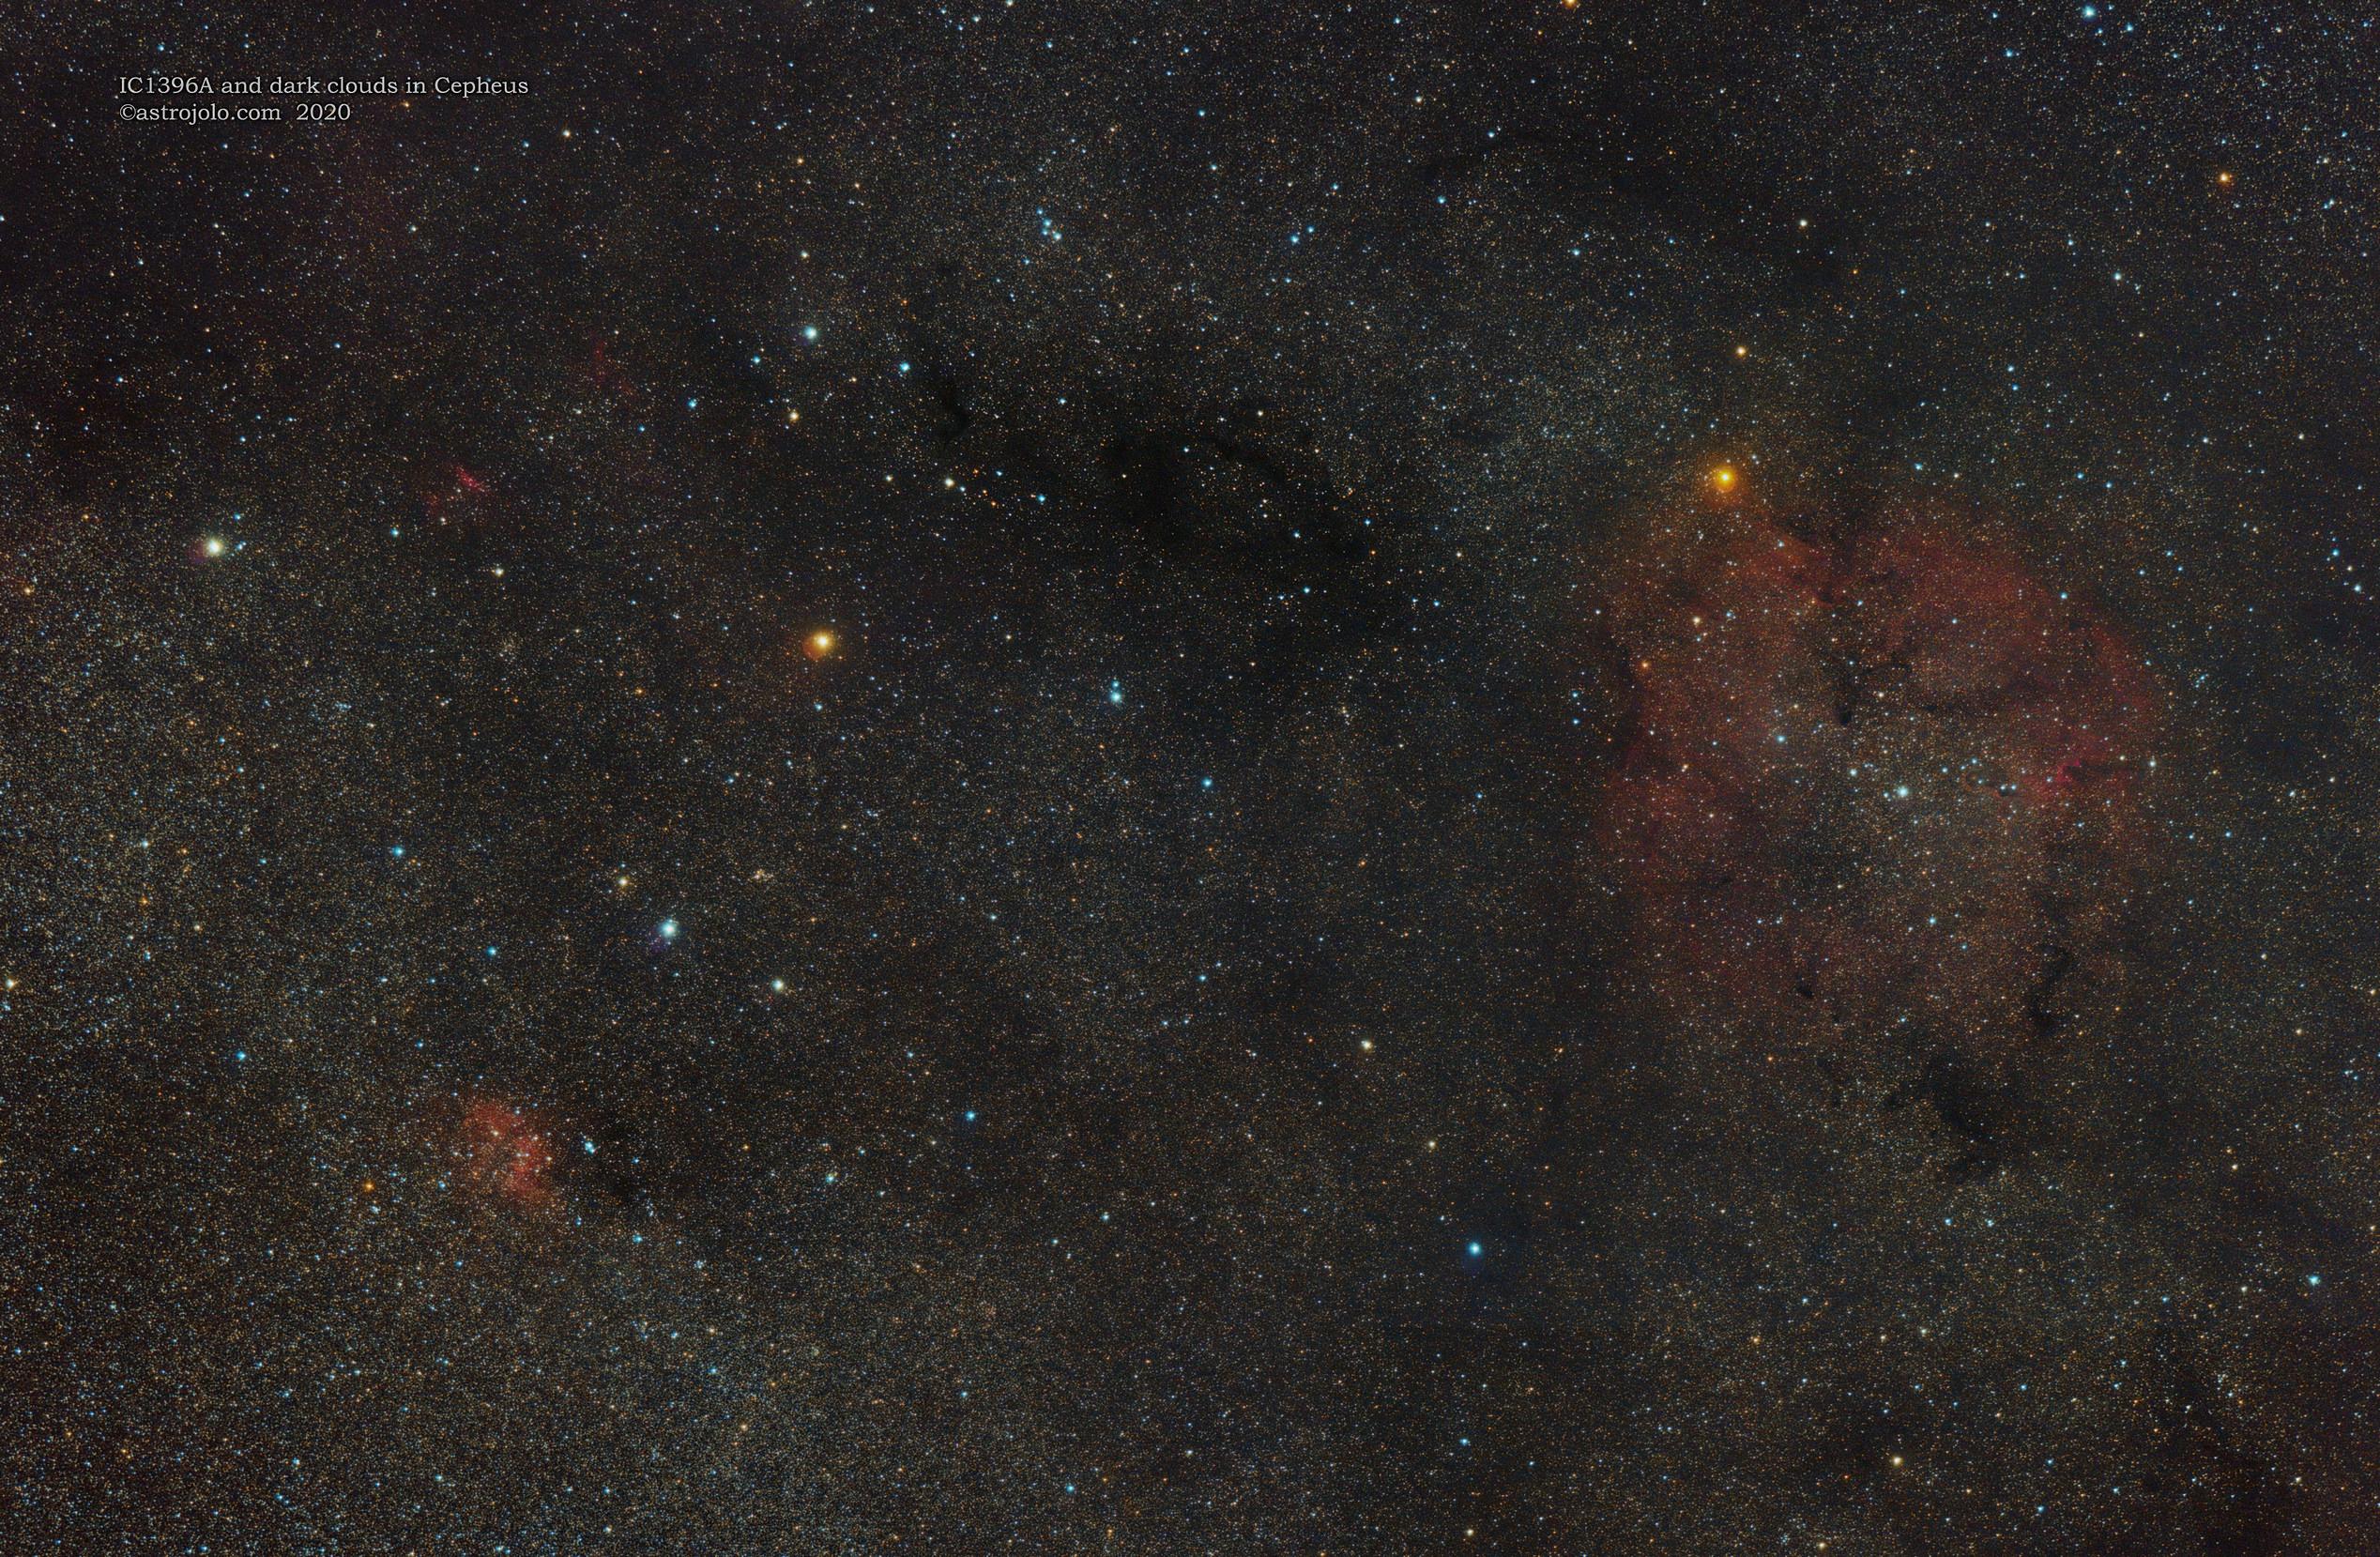 2020-09-11-cepheus-starmin.jpg